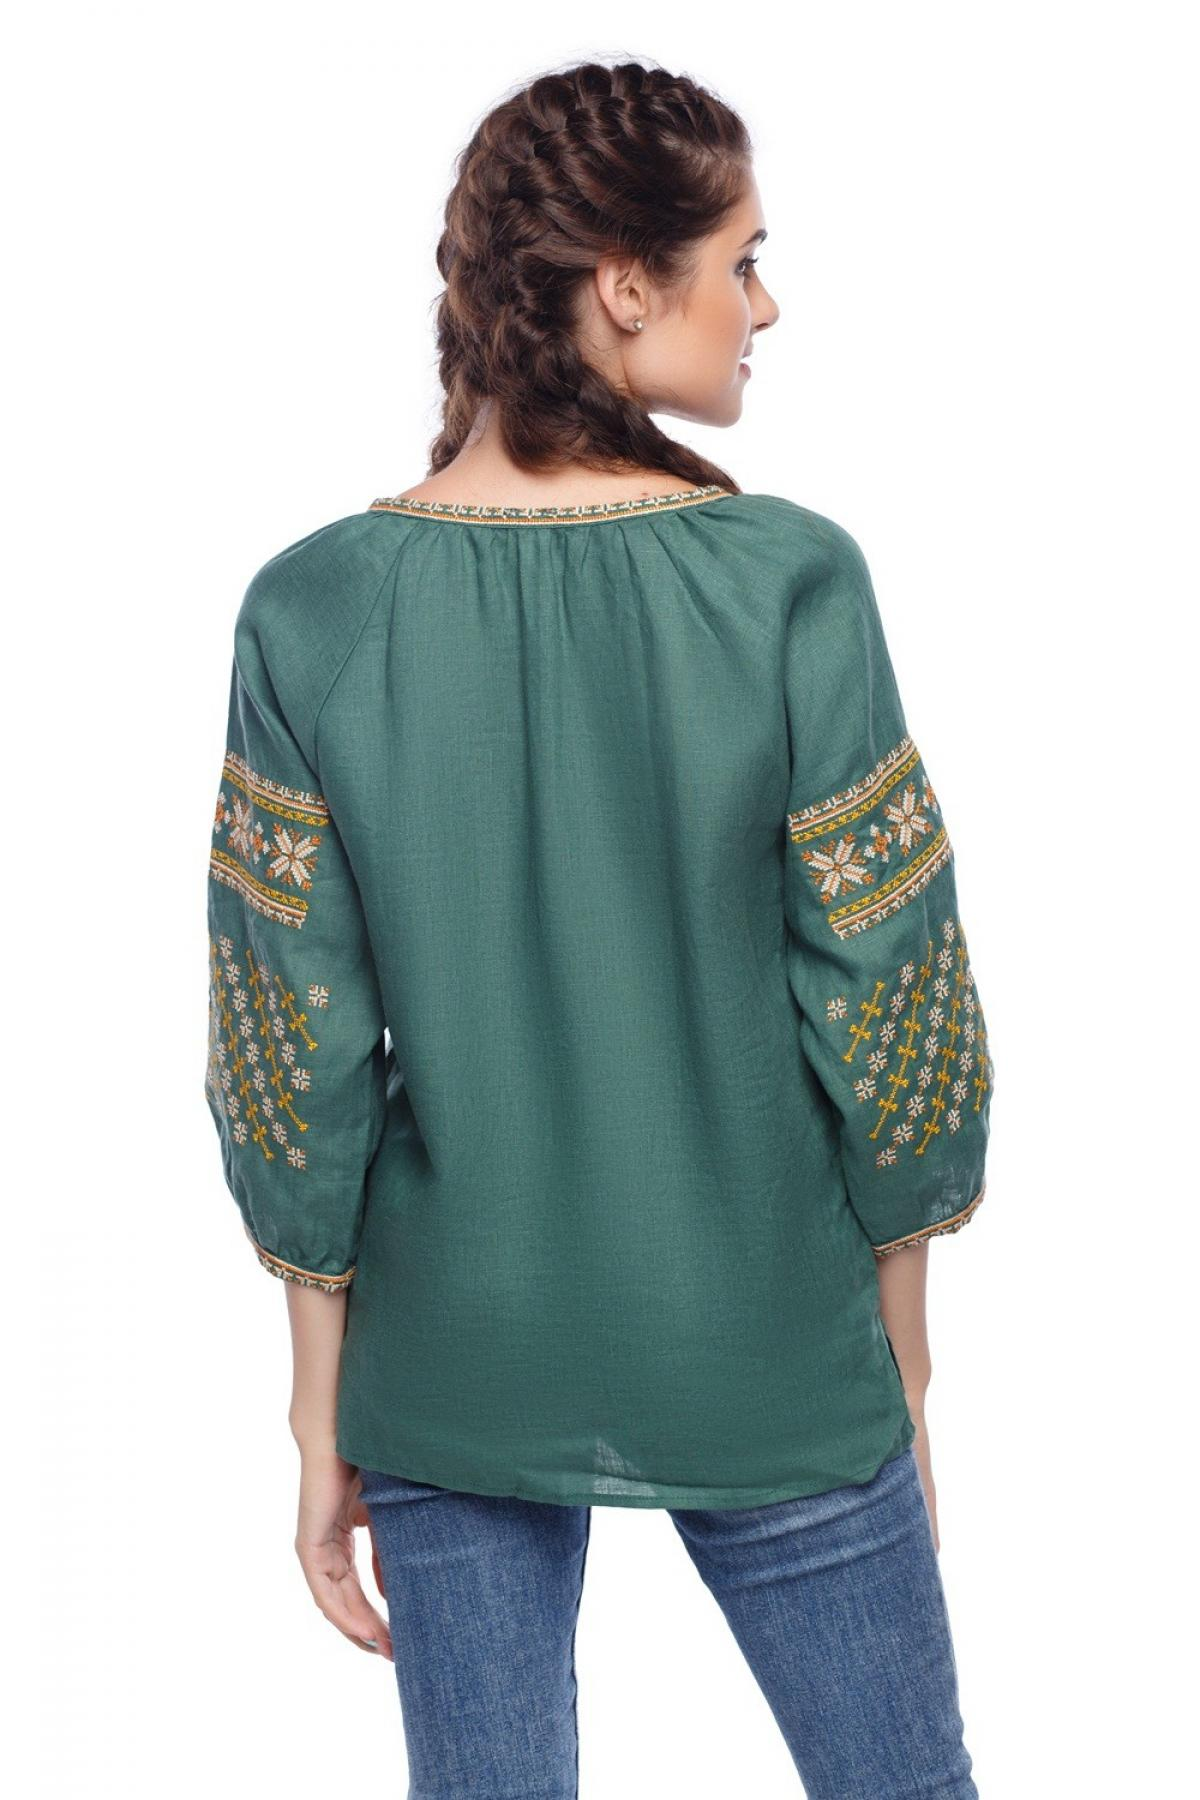 Green embroidered shirt with 3/4 sleeves. Photo №2. | Narodnyi dim Ukraine